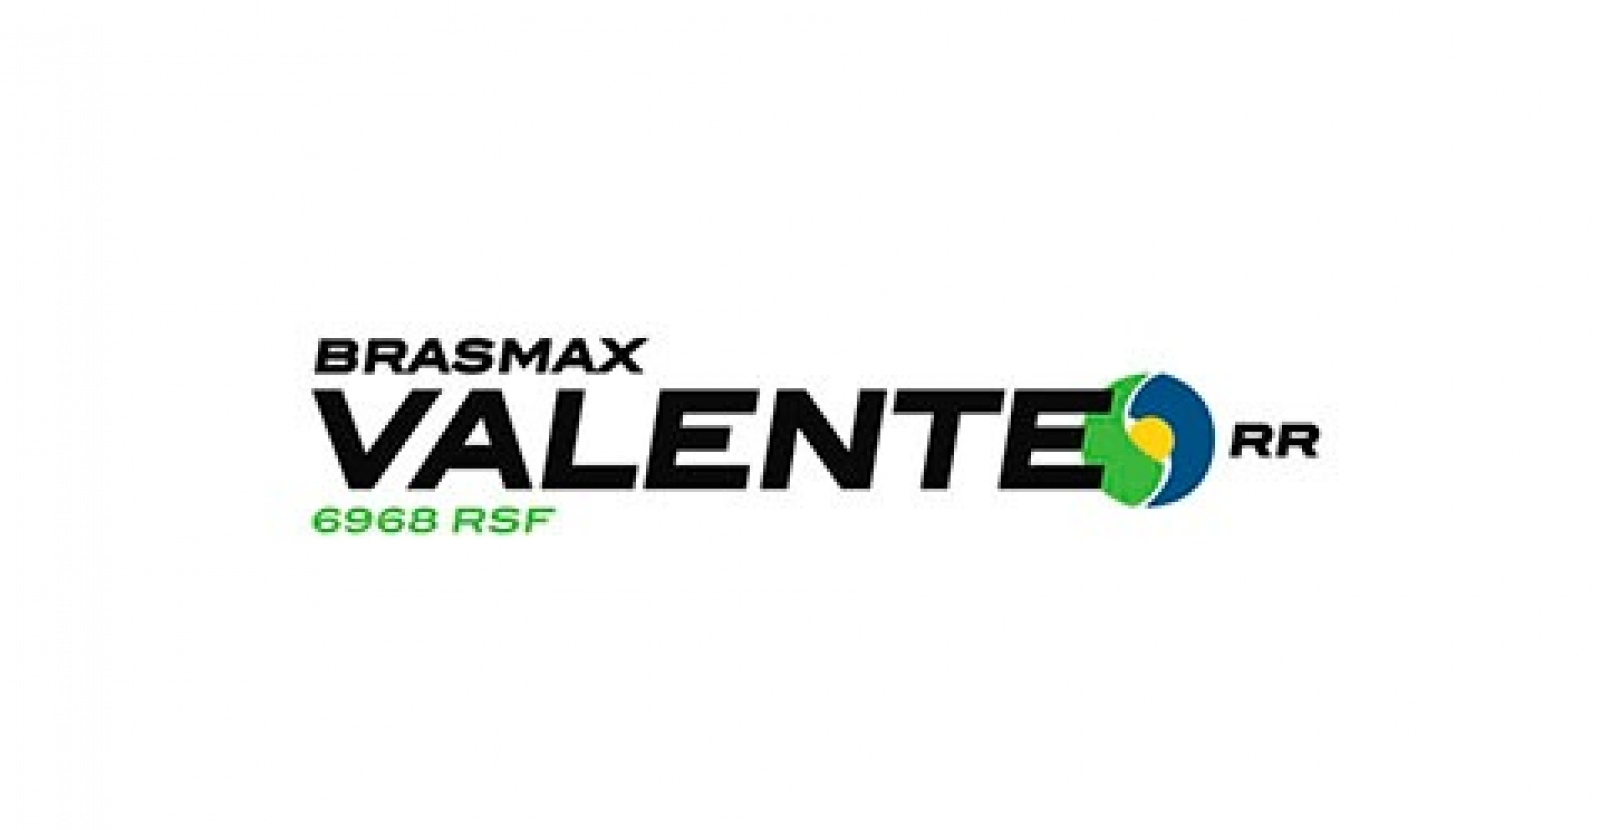 BRASMAX VALENTE